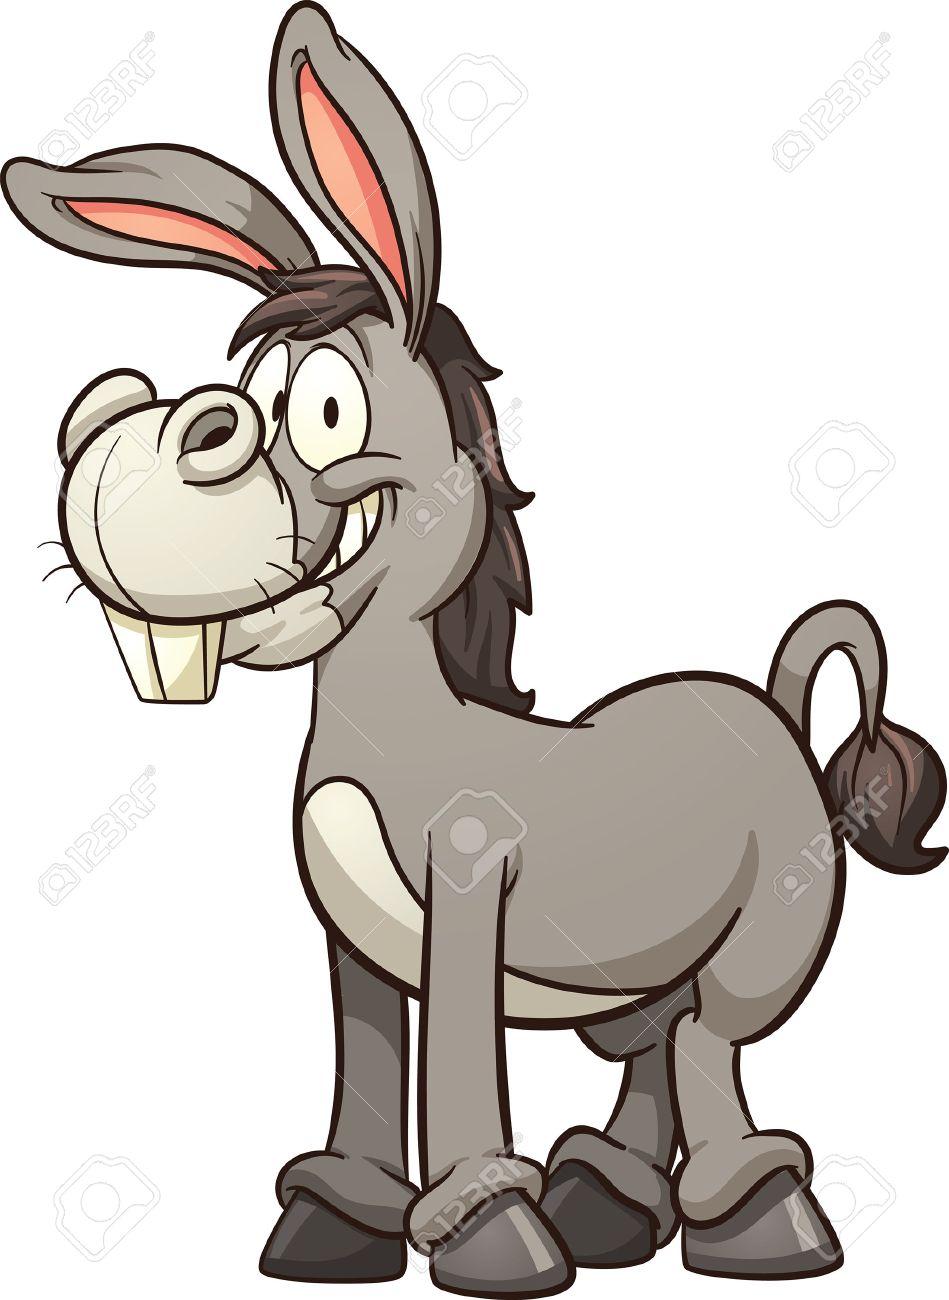 949x1300 Cartoon Donkey. Vector Clip Art Illustration With Simple Gradients